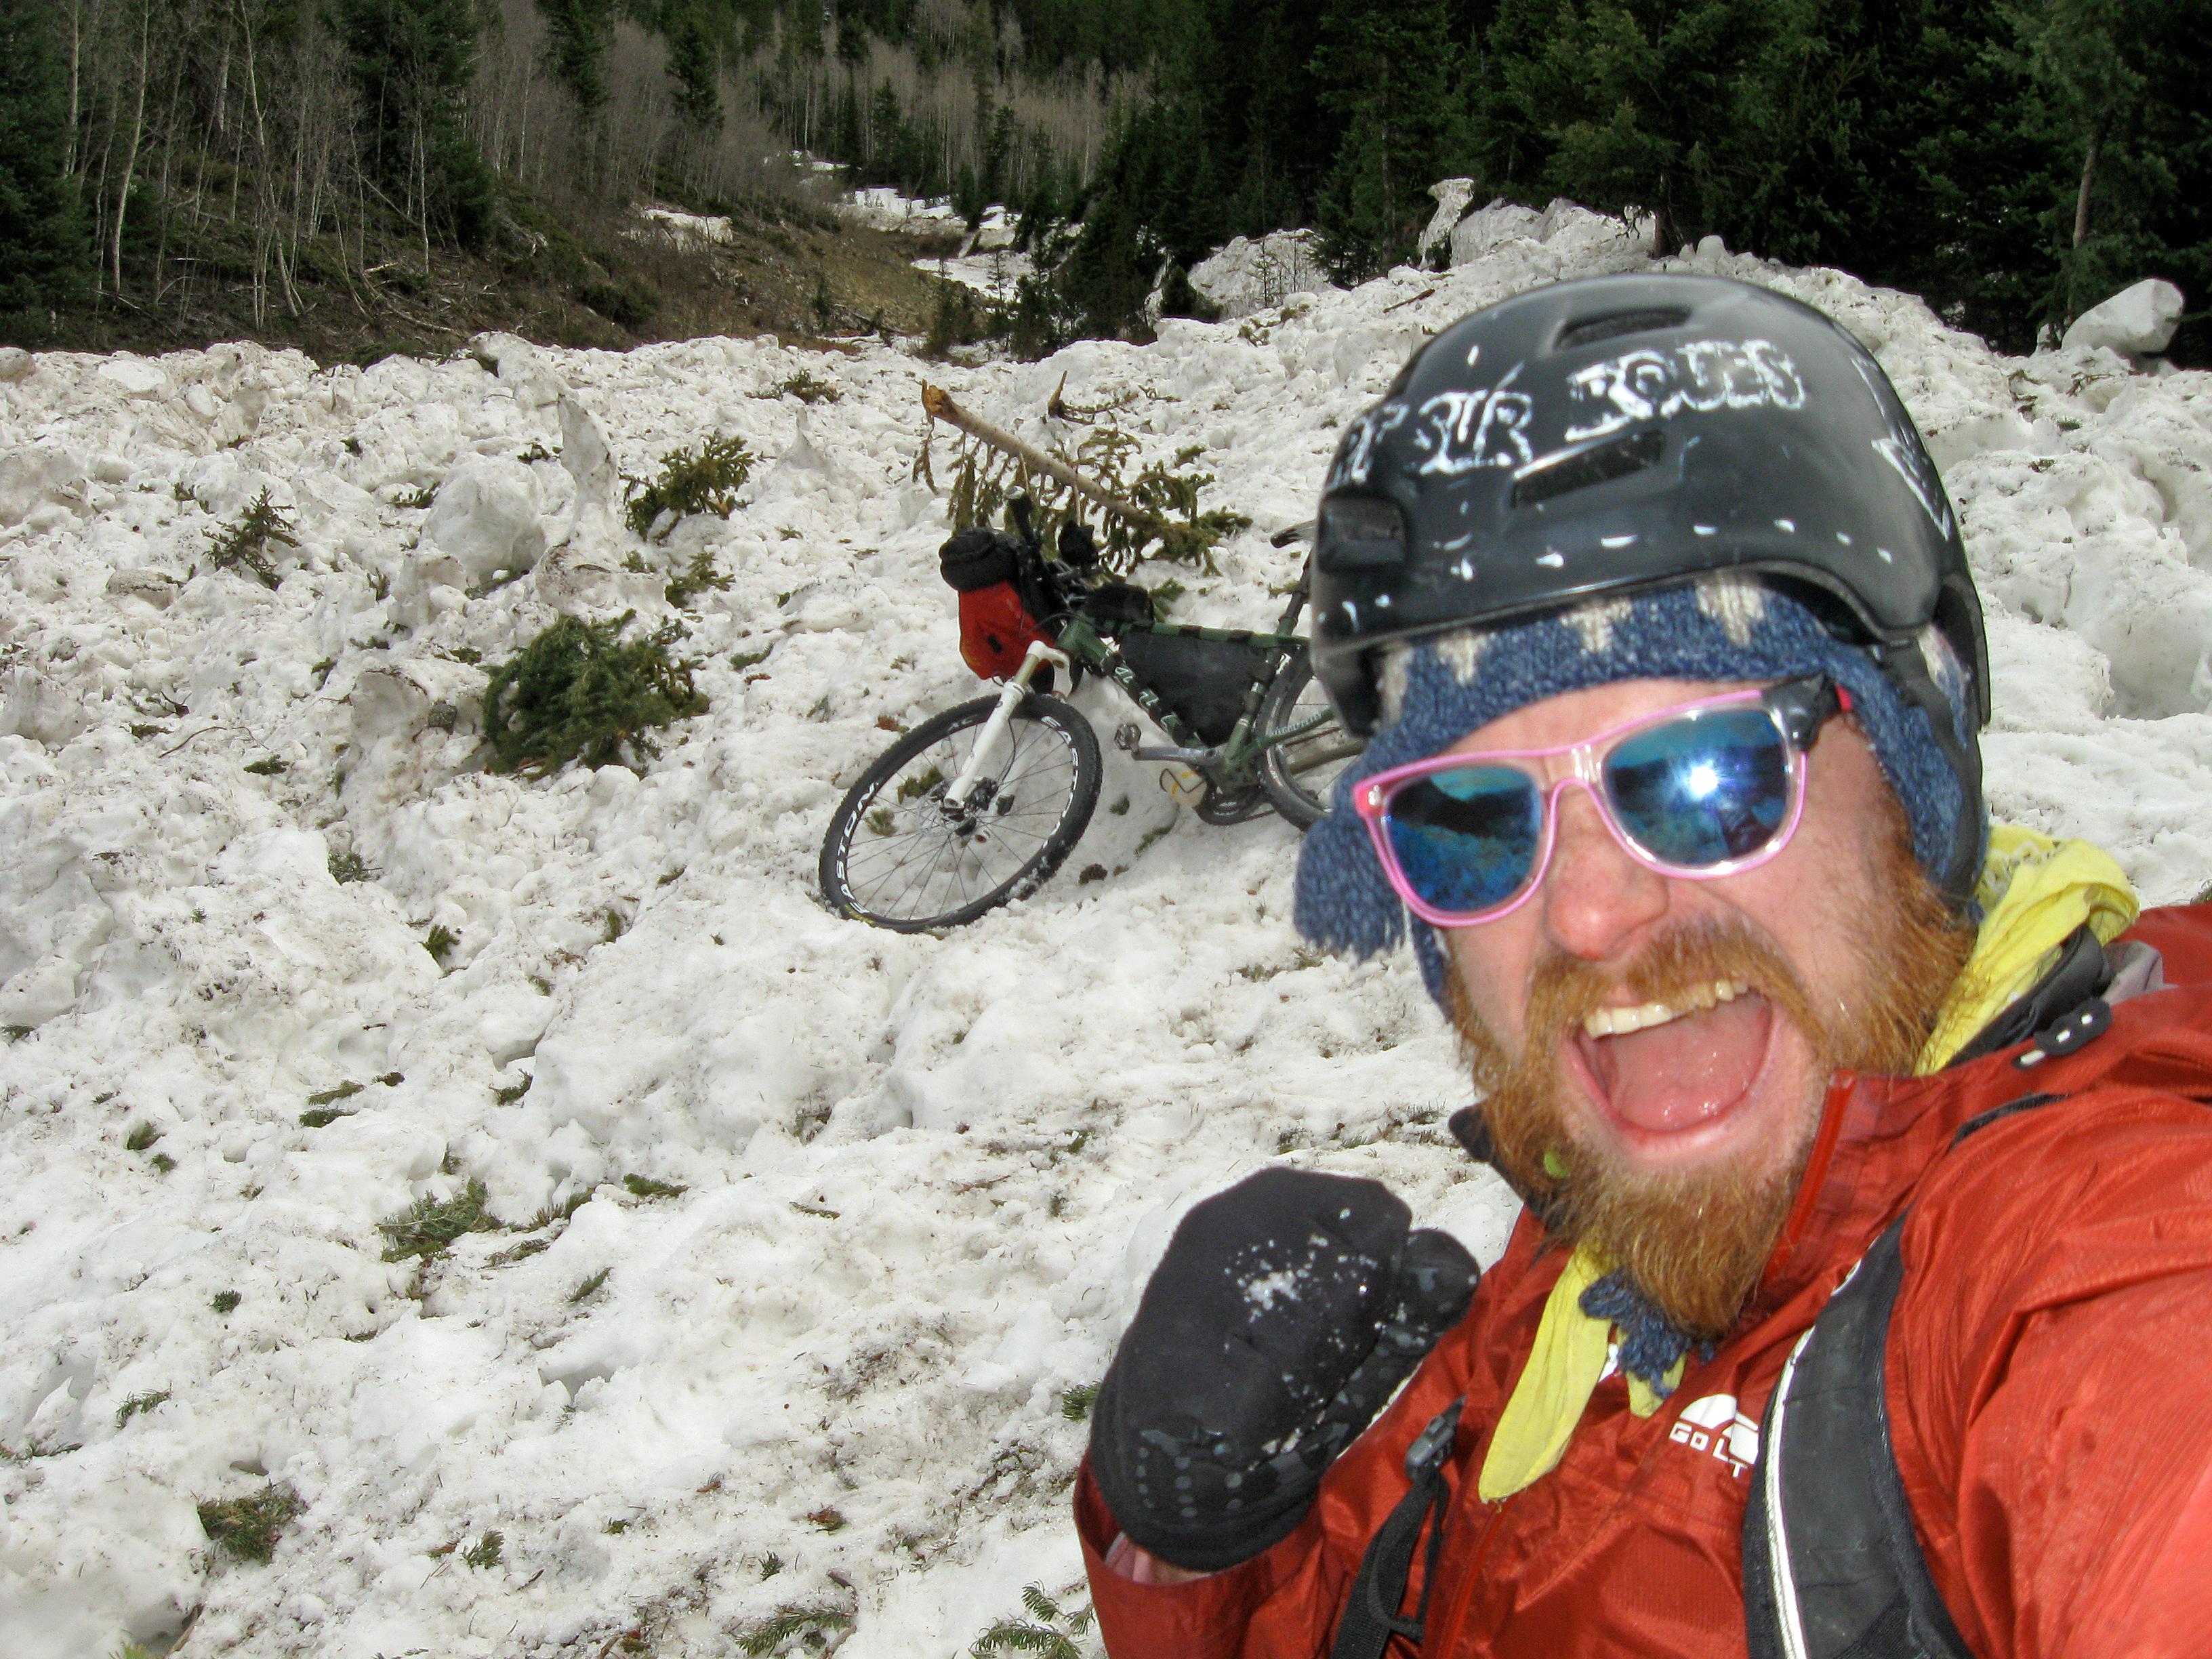 Avalanche! On the Bikepath